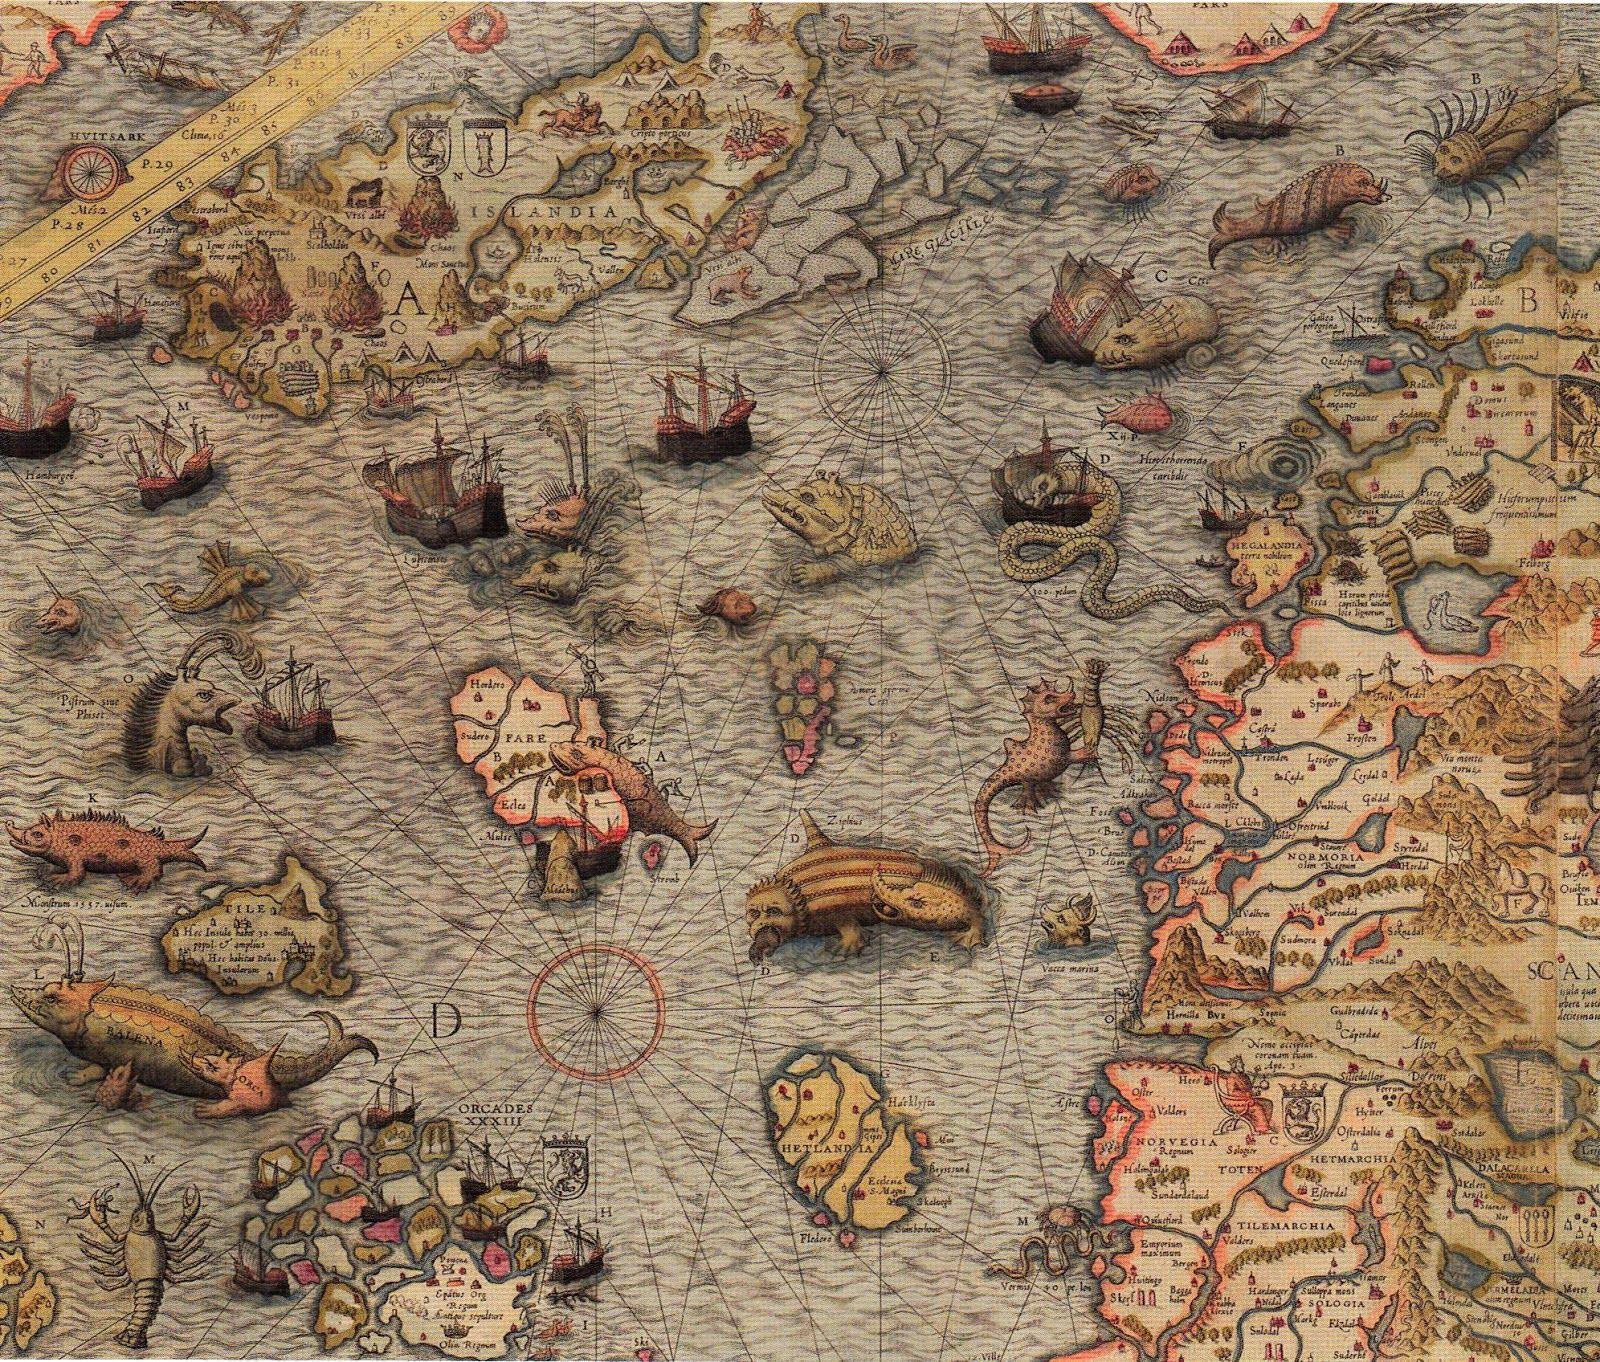 Criptozoologia cartográfica?